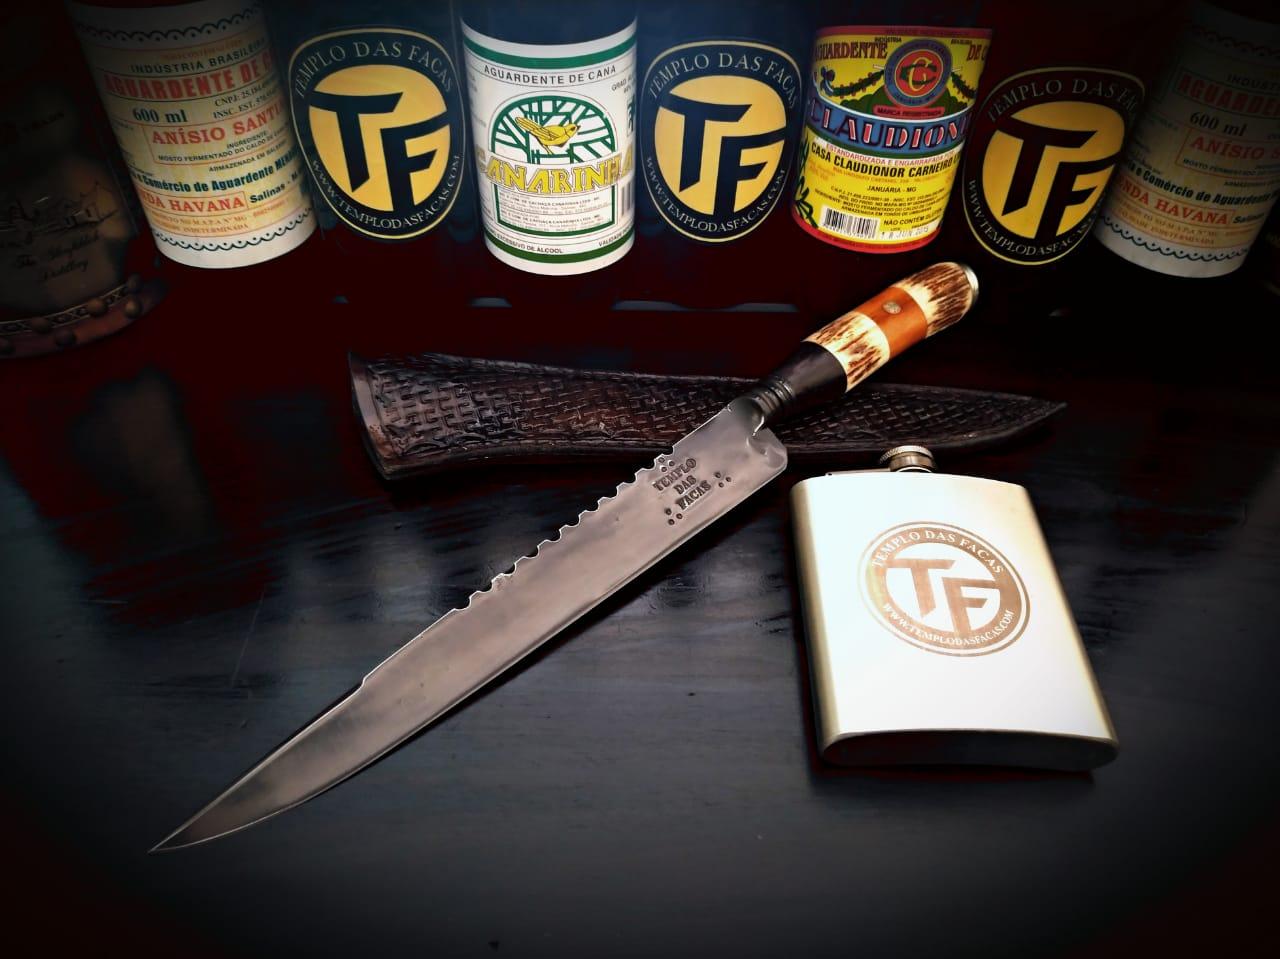 Faca artesanal forjada cabo jacarandá e cervo templo das facas 10 polegadas